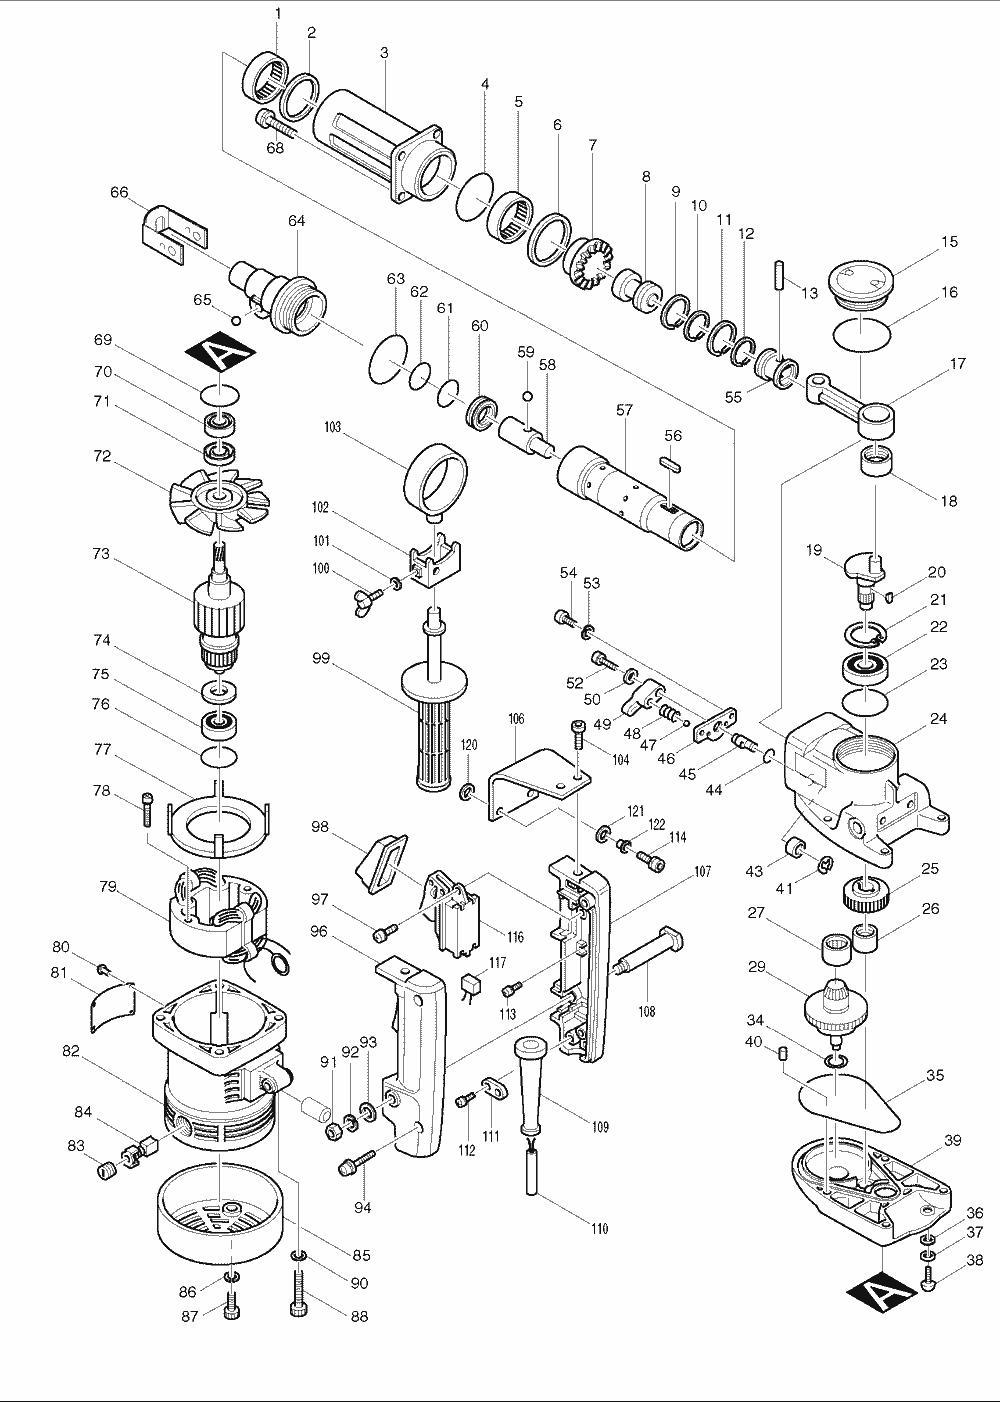 Buy Makita HR3851 1-1/2 Inch Spline Drive, AC/DC